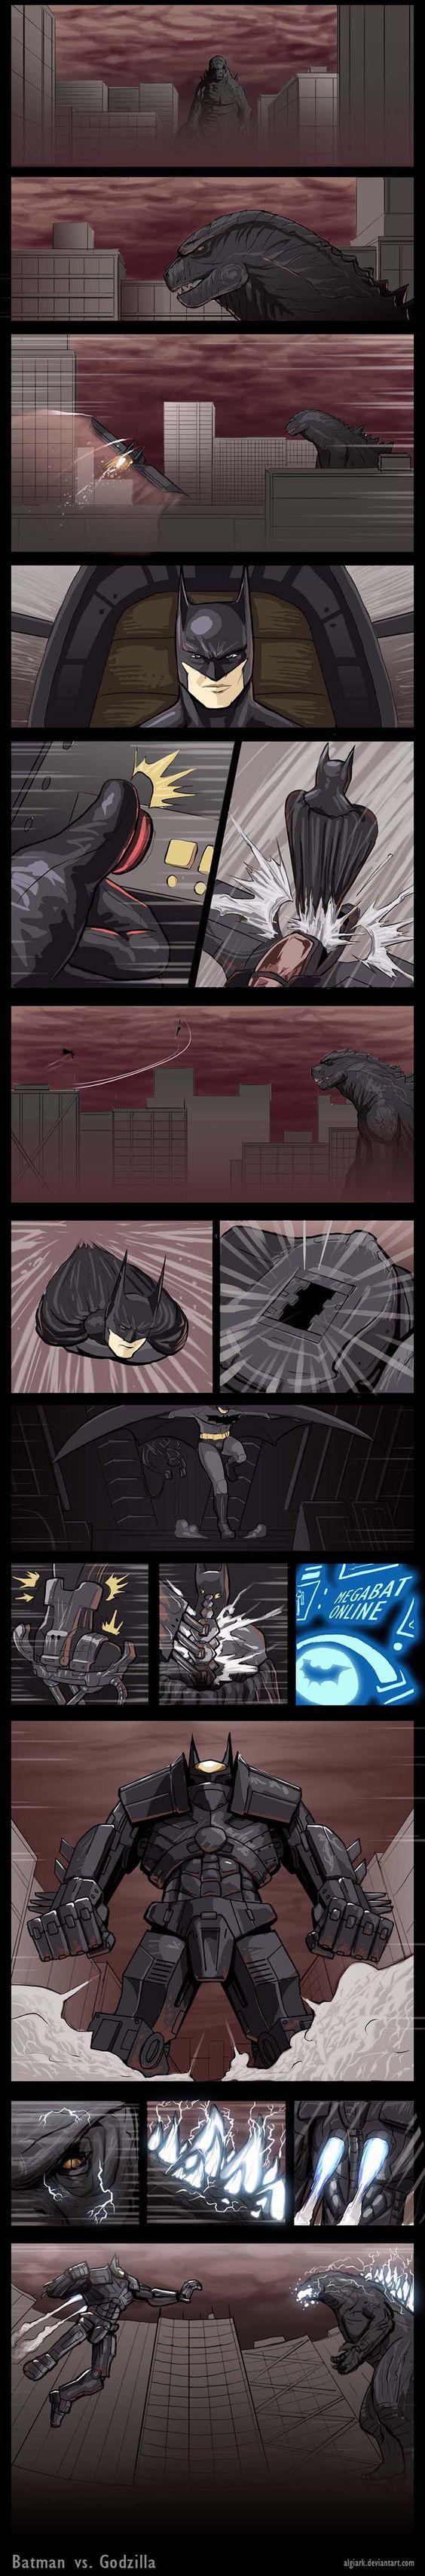 Batman vs. Godzilla Batman because he's batman, he took down superman for crying out loud!